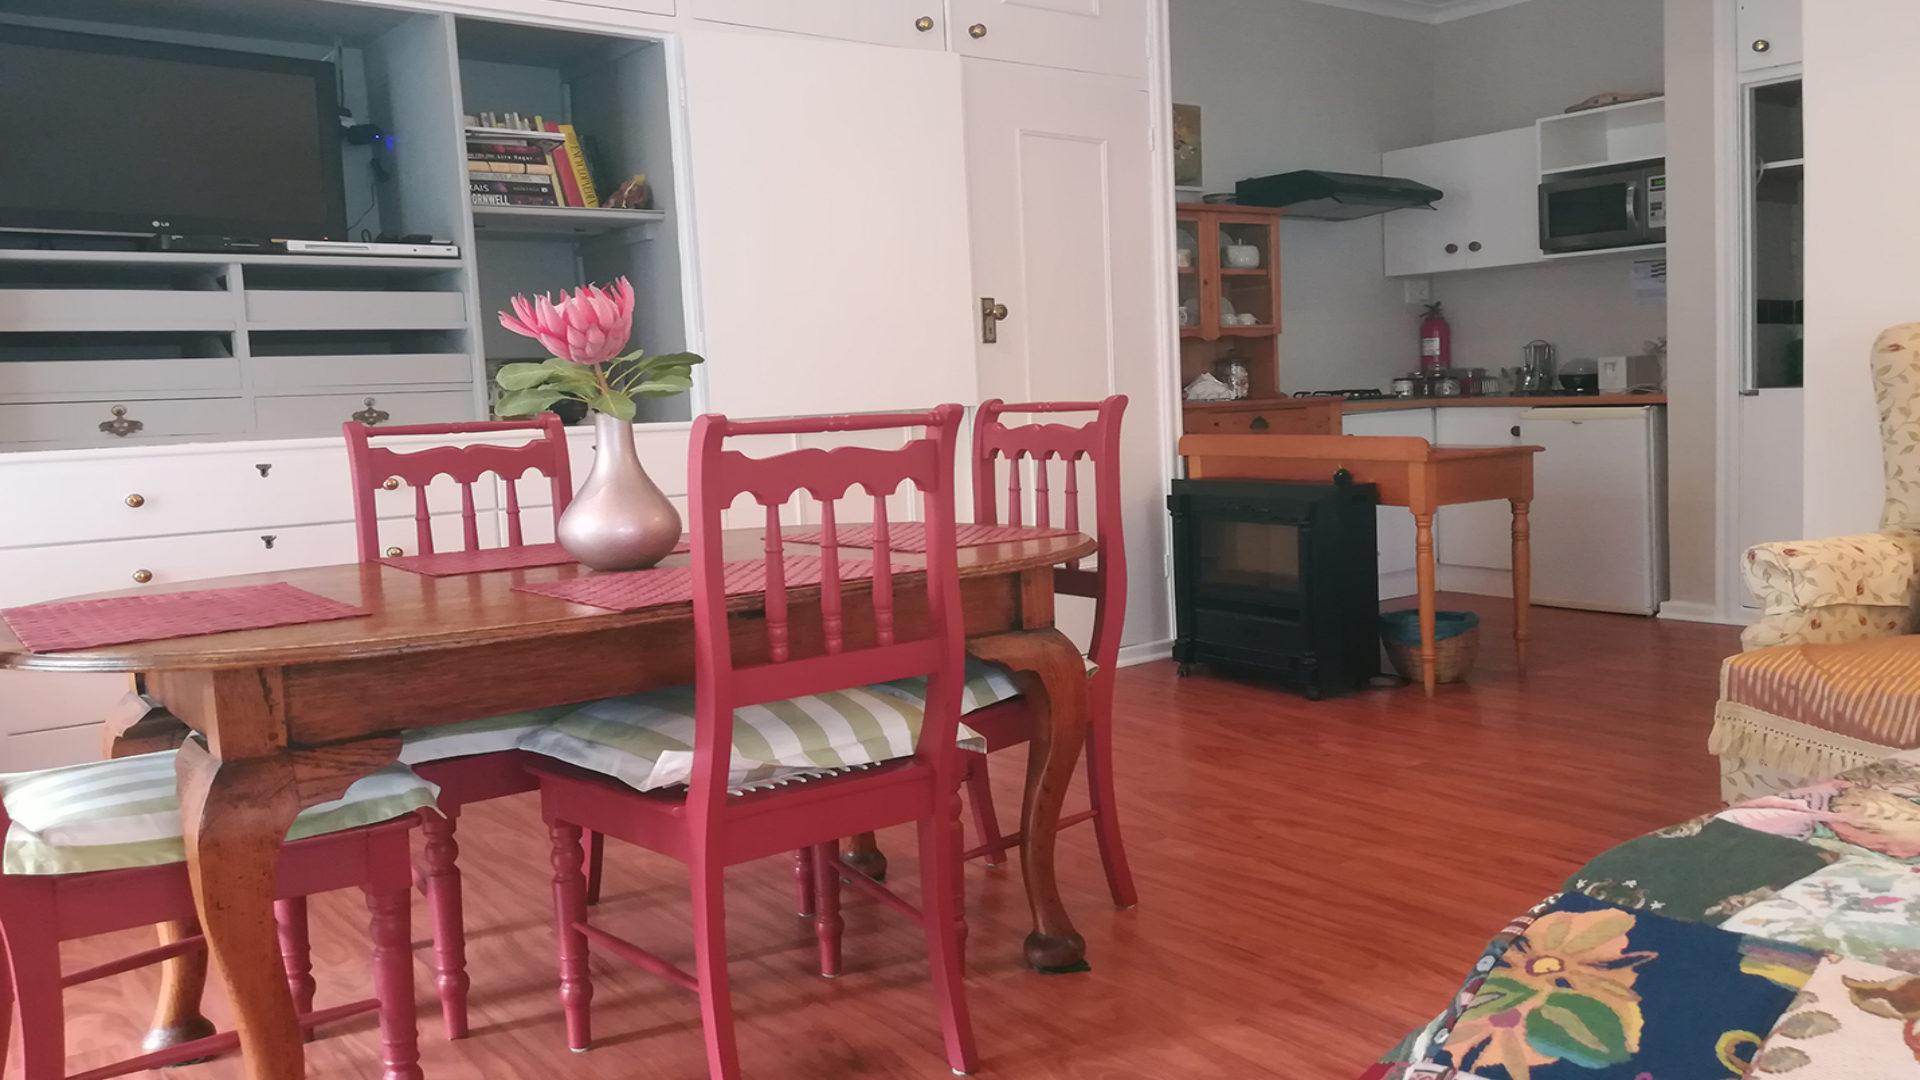 Eastbury Cottage rose room dining and kitchenette